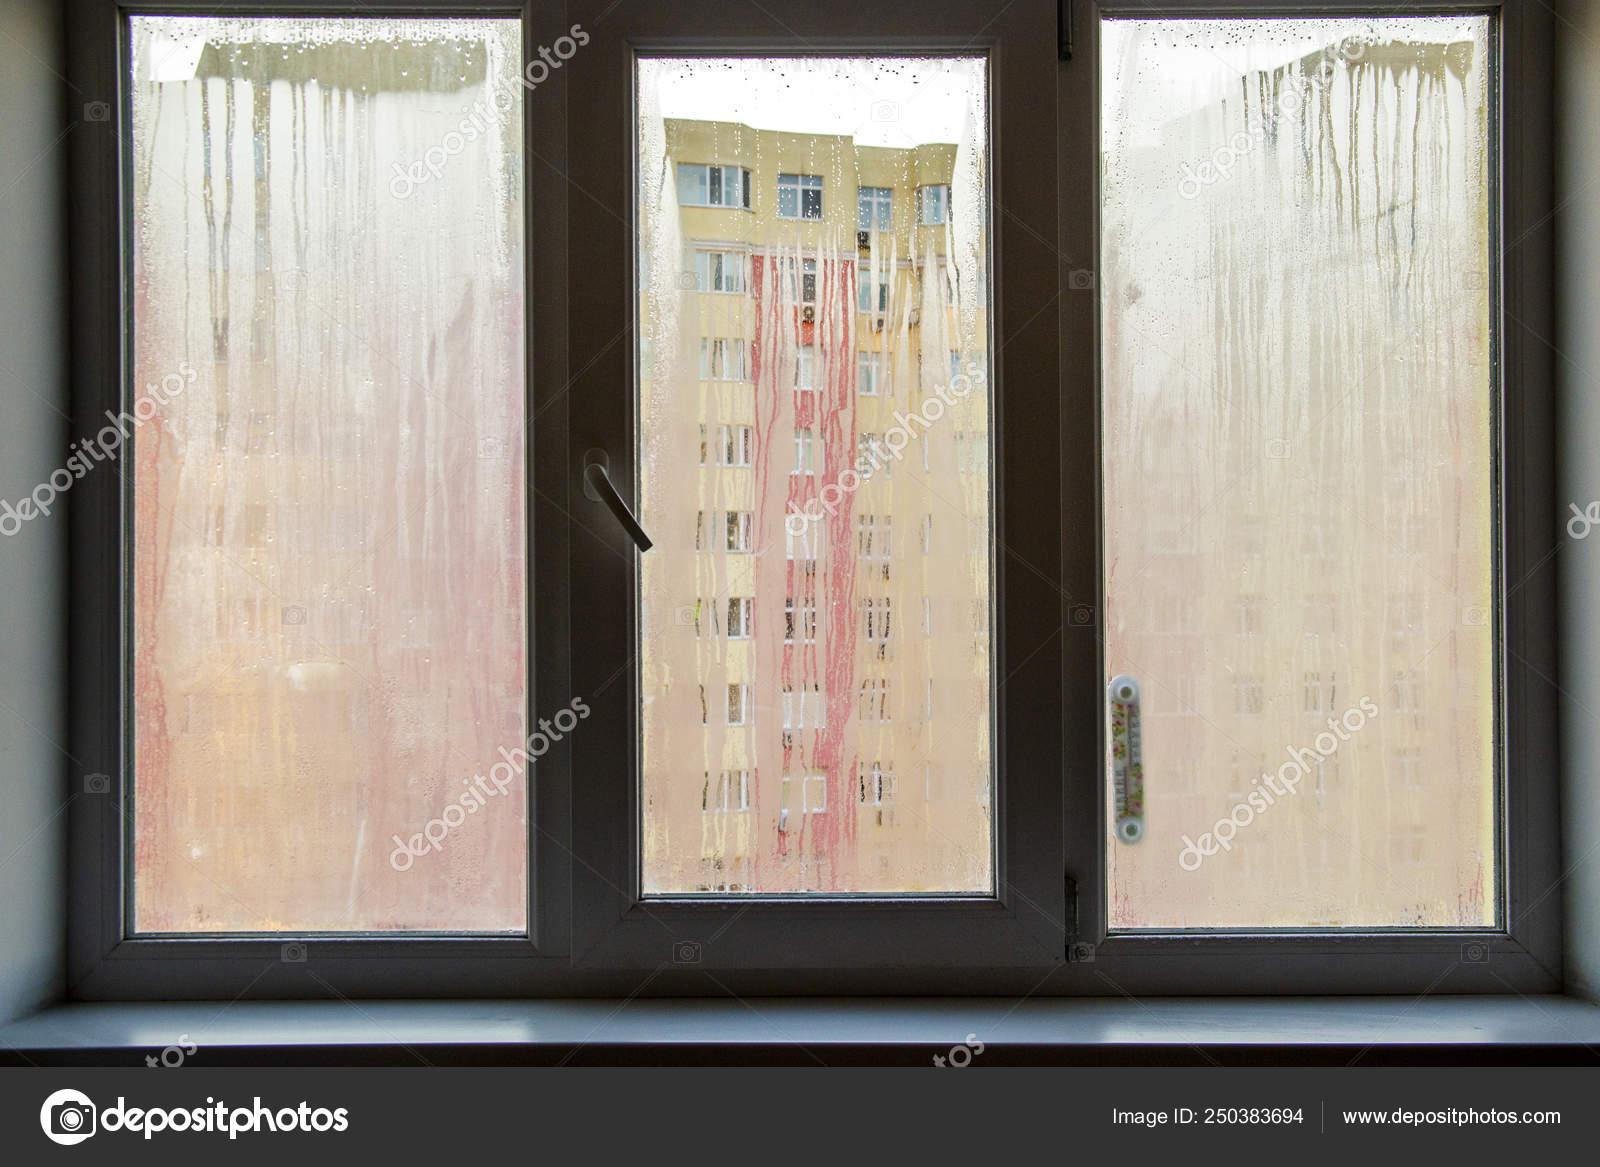 Ventanas Pvc Stock.Problema Ventanas Pvc Niebla Foto De Stock C Kiyechka